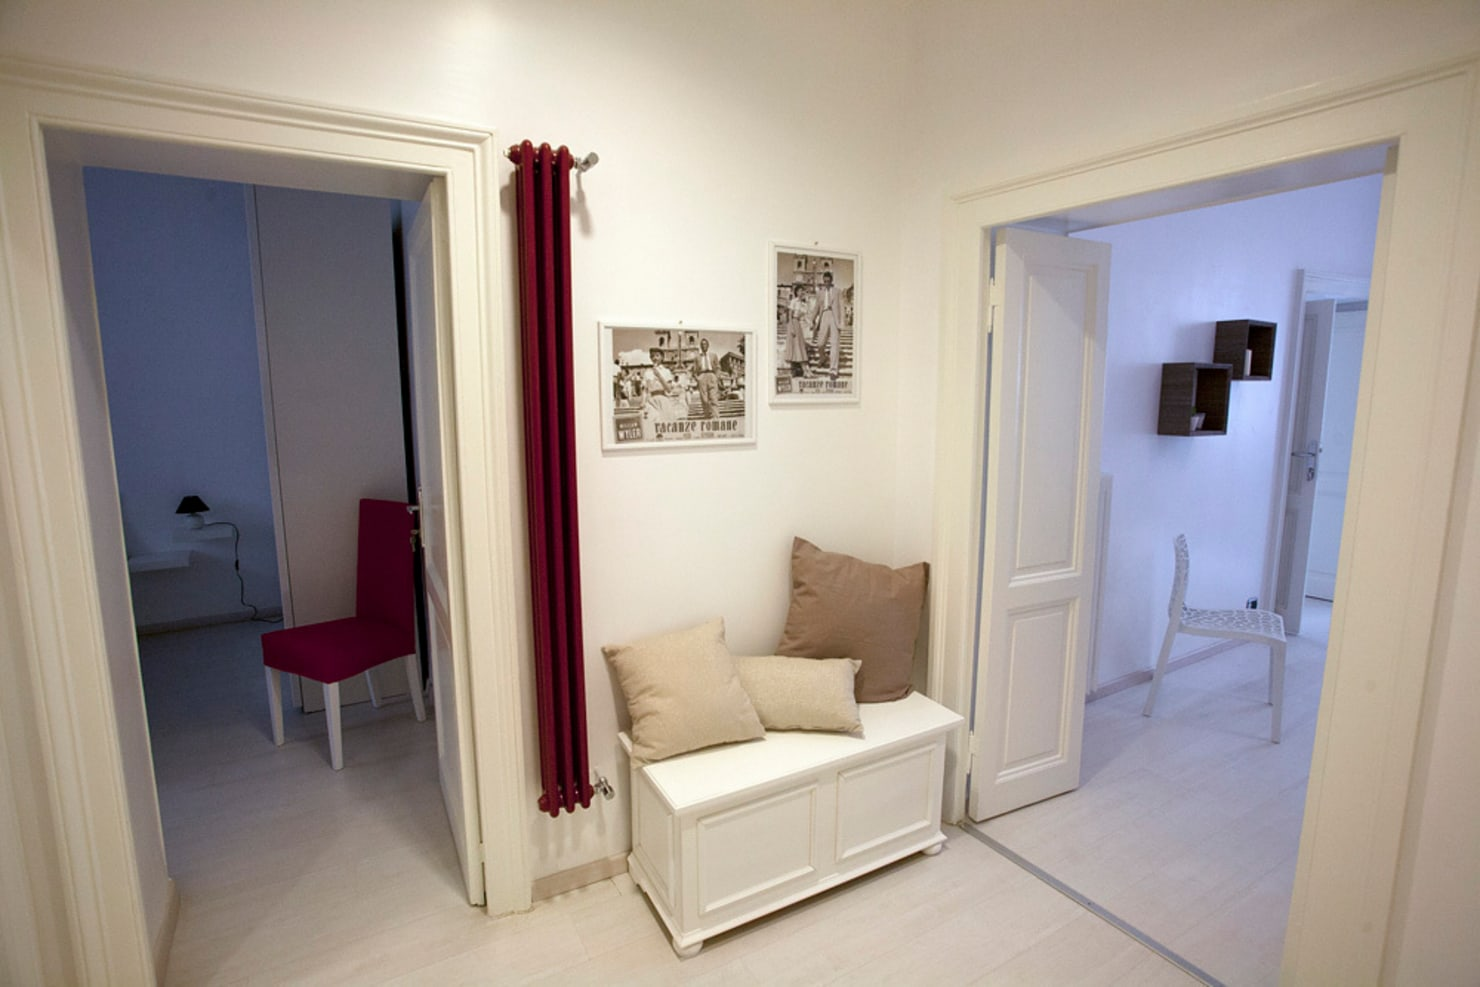 Un apartamento pequeño con muchas ideas para inspirarte